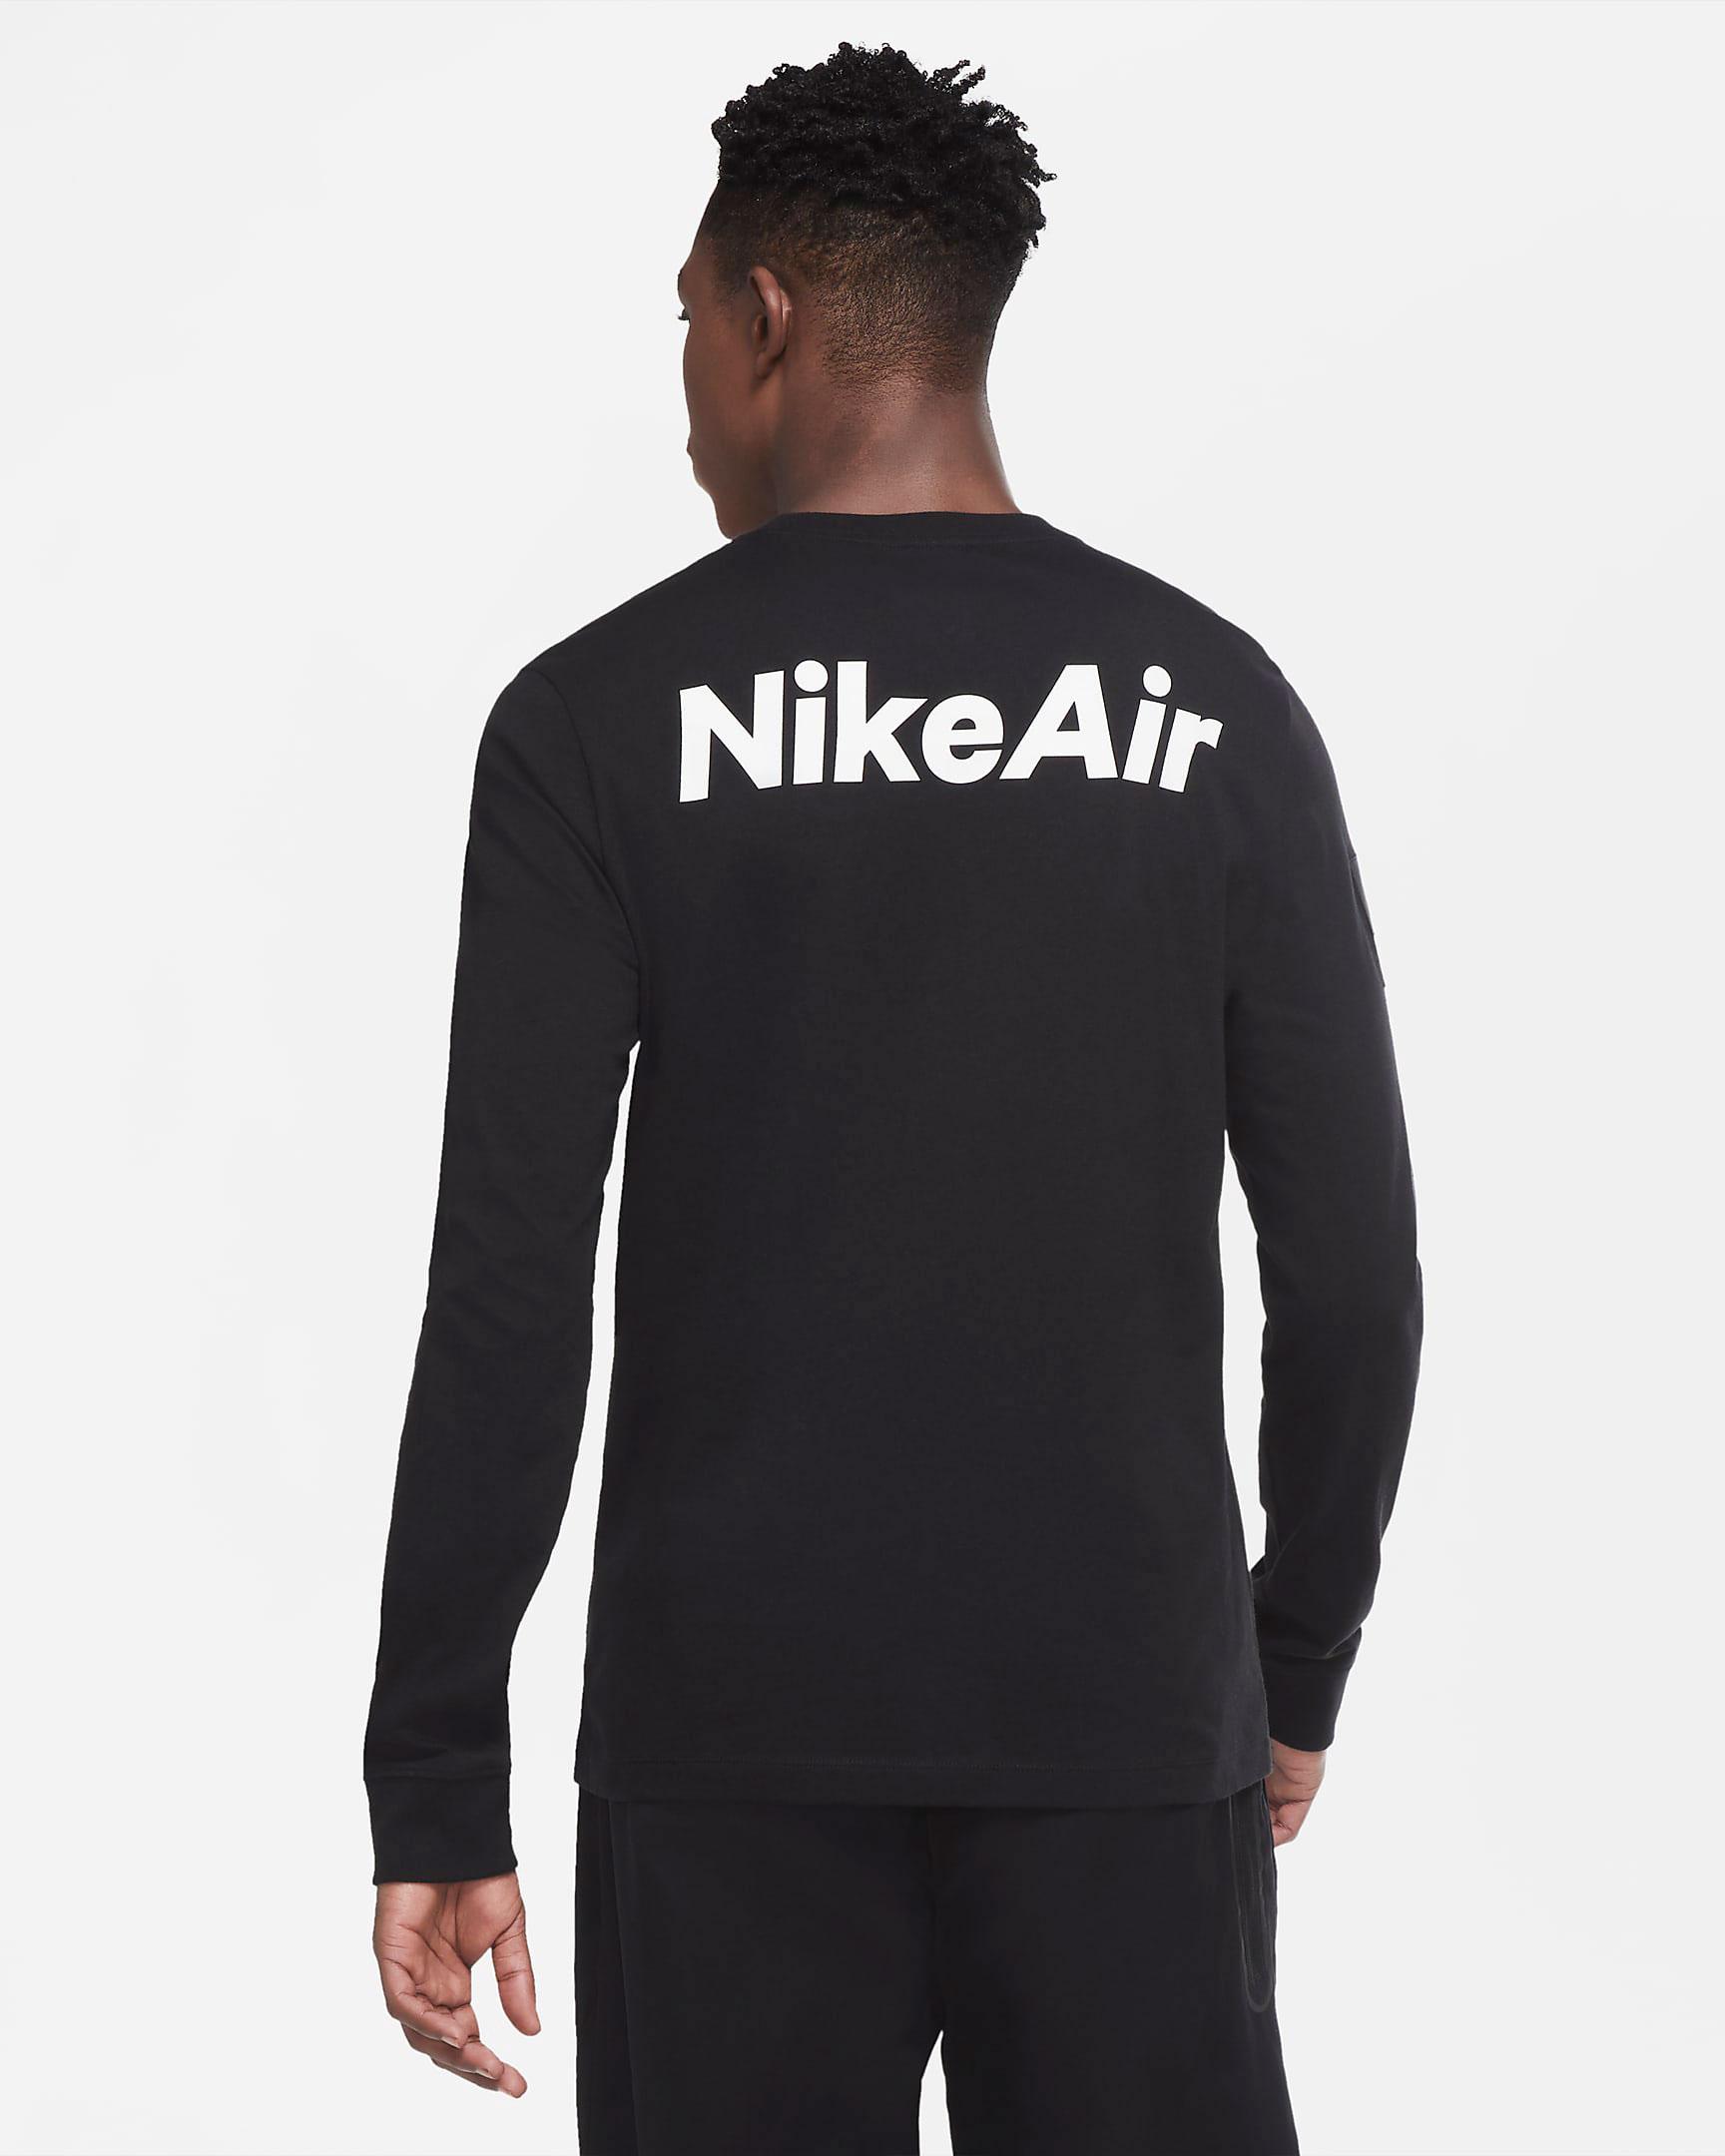 nike-air-vapormax-flyknit-2020-oreo-shirt-7